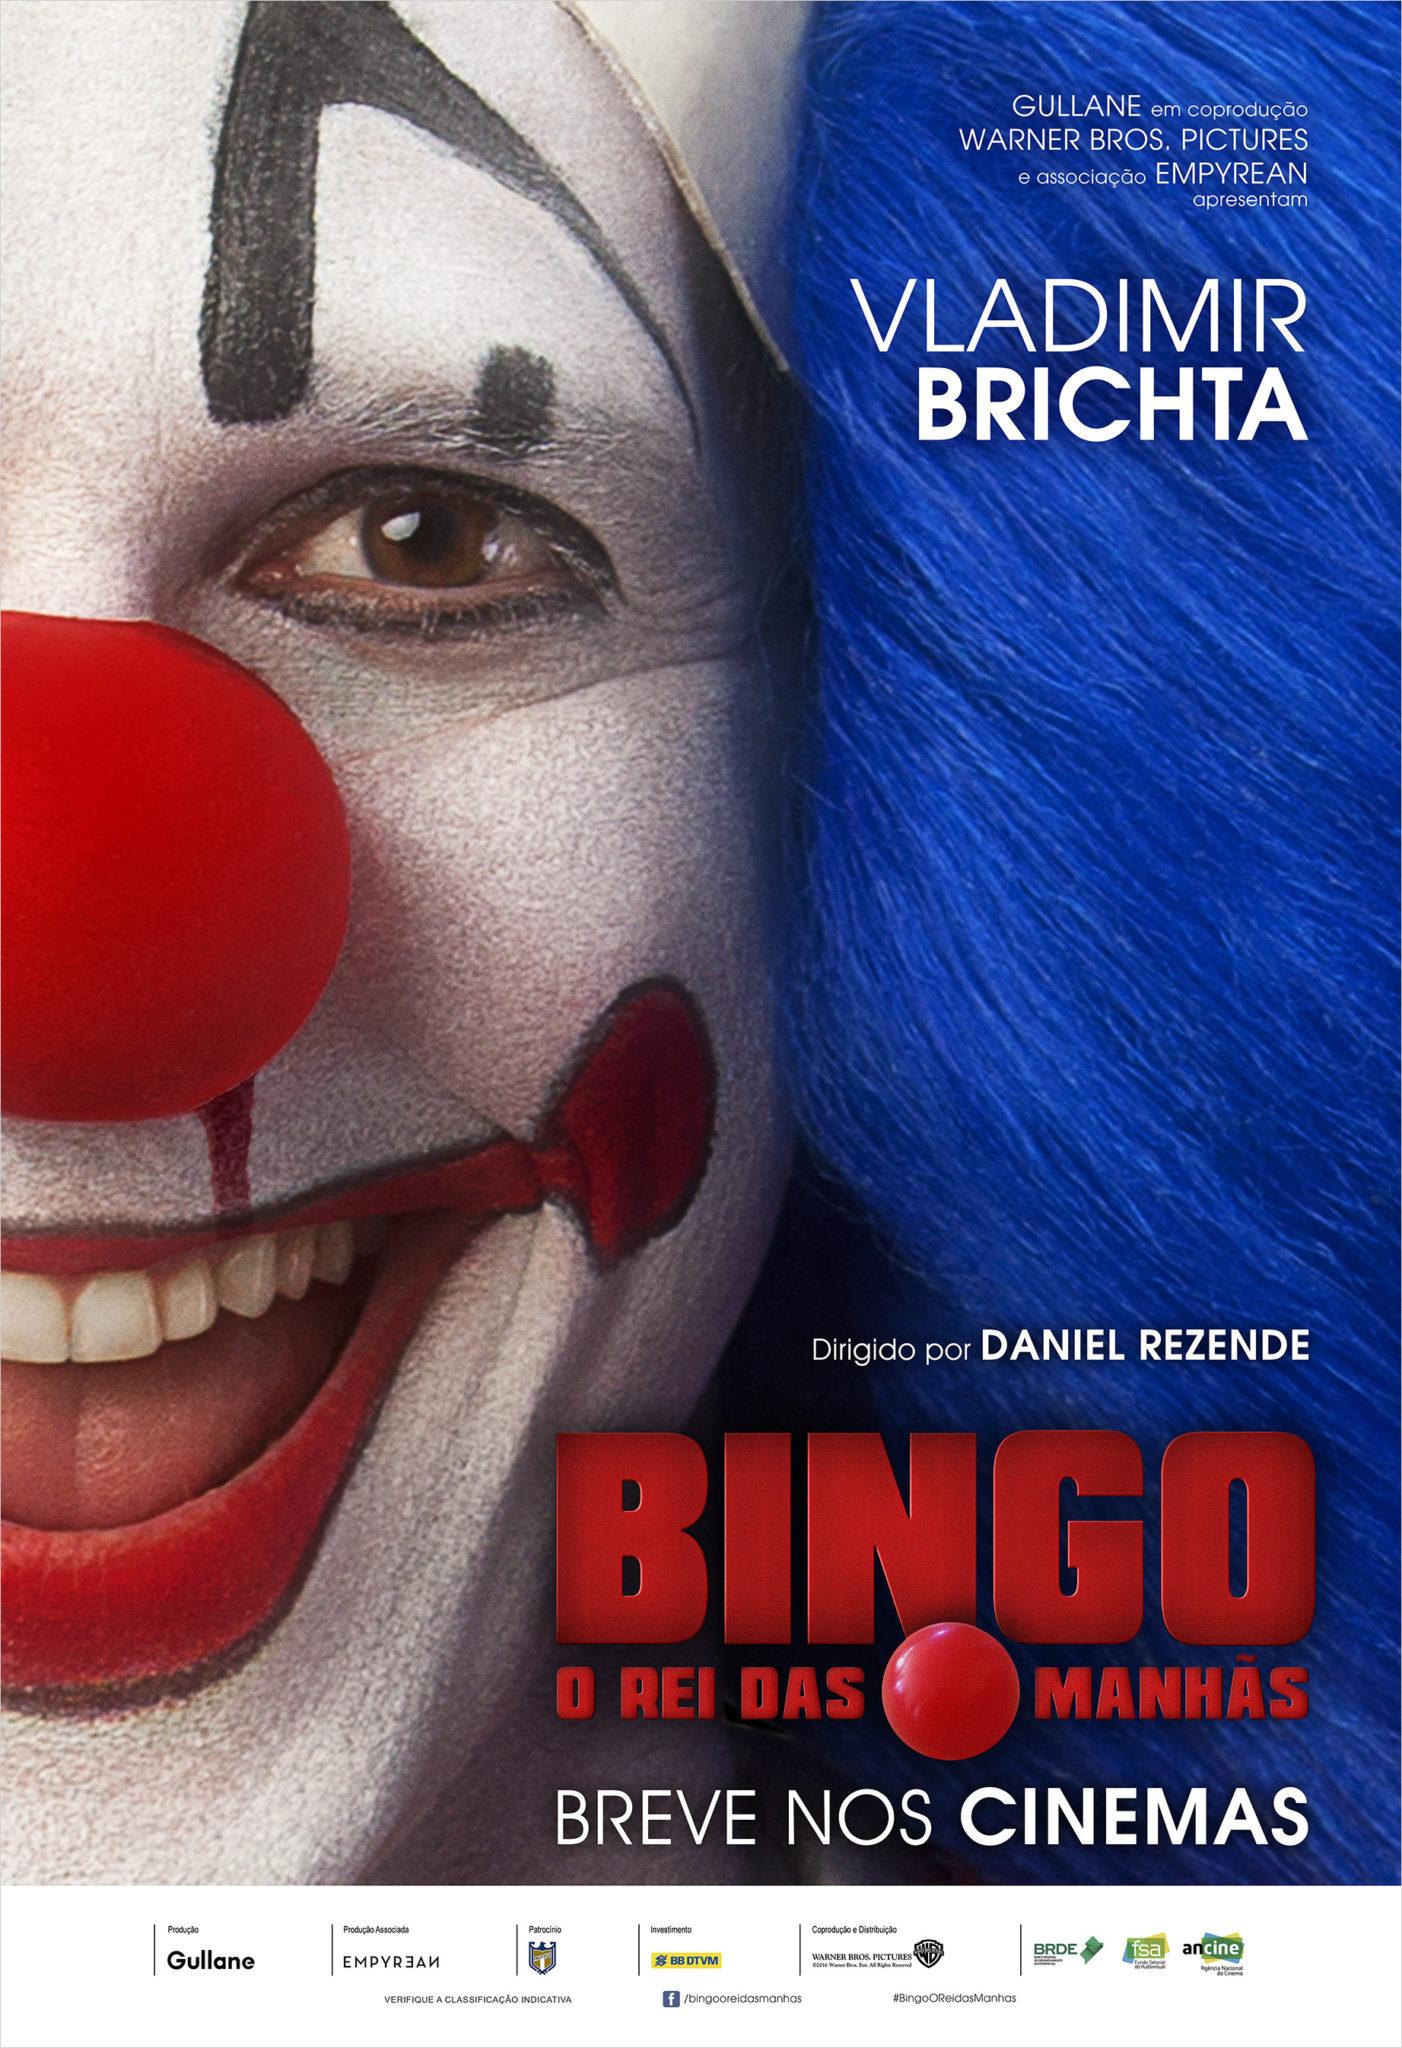 bingo_teaser_ed_JPG_2_gg